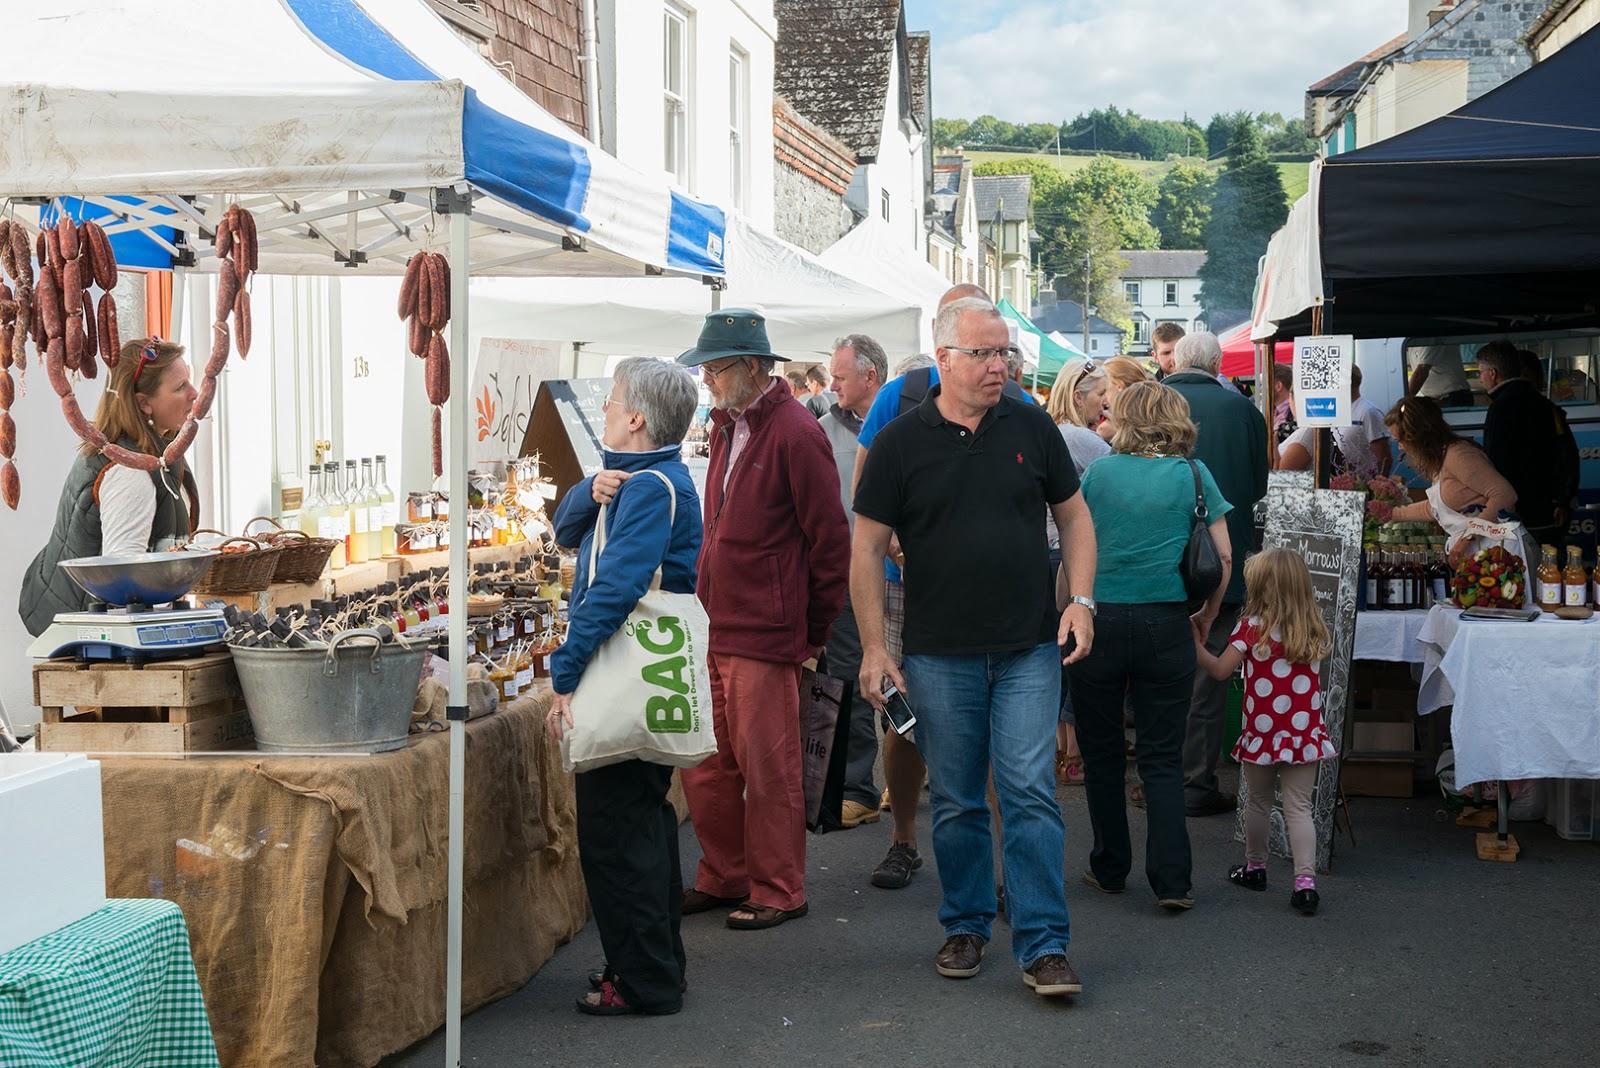 barnabys-brewhouse-asburton-food-festival-september